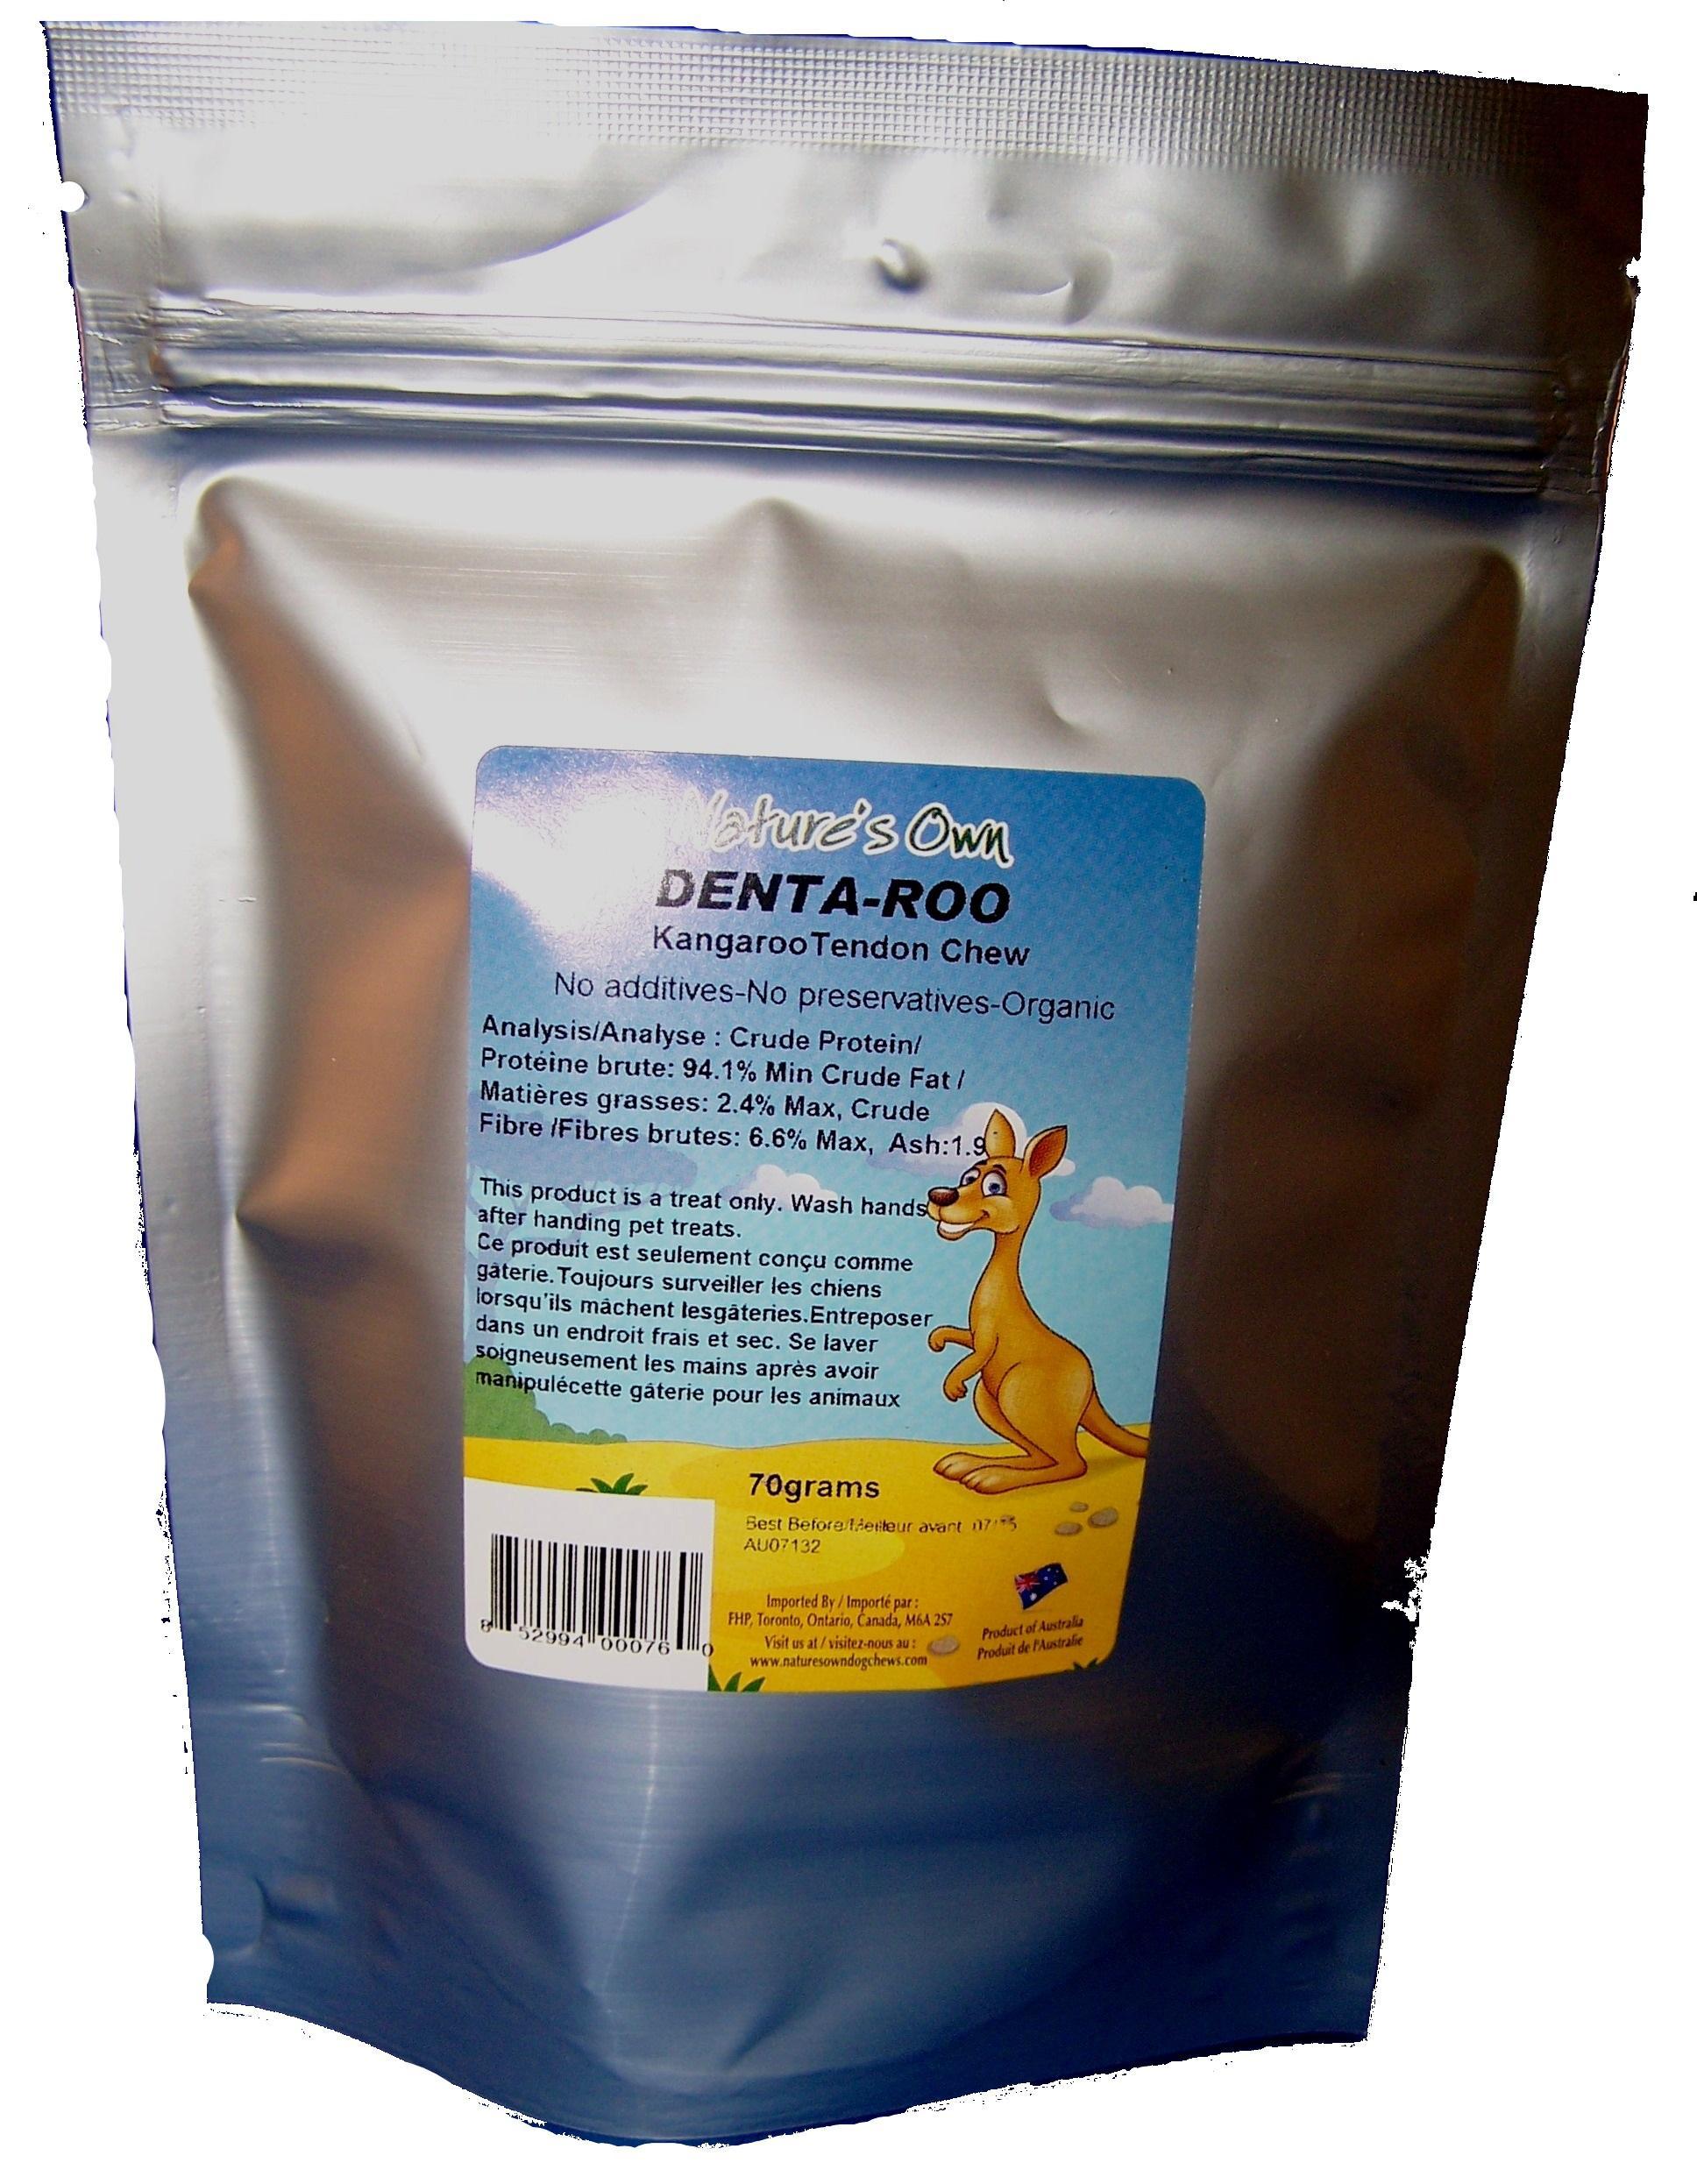 Nature's Own Dog Chews Denta-Roo Kangaroo Tendons Dog Treats, 70-gram